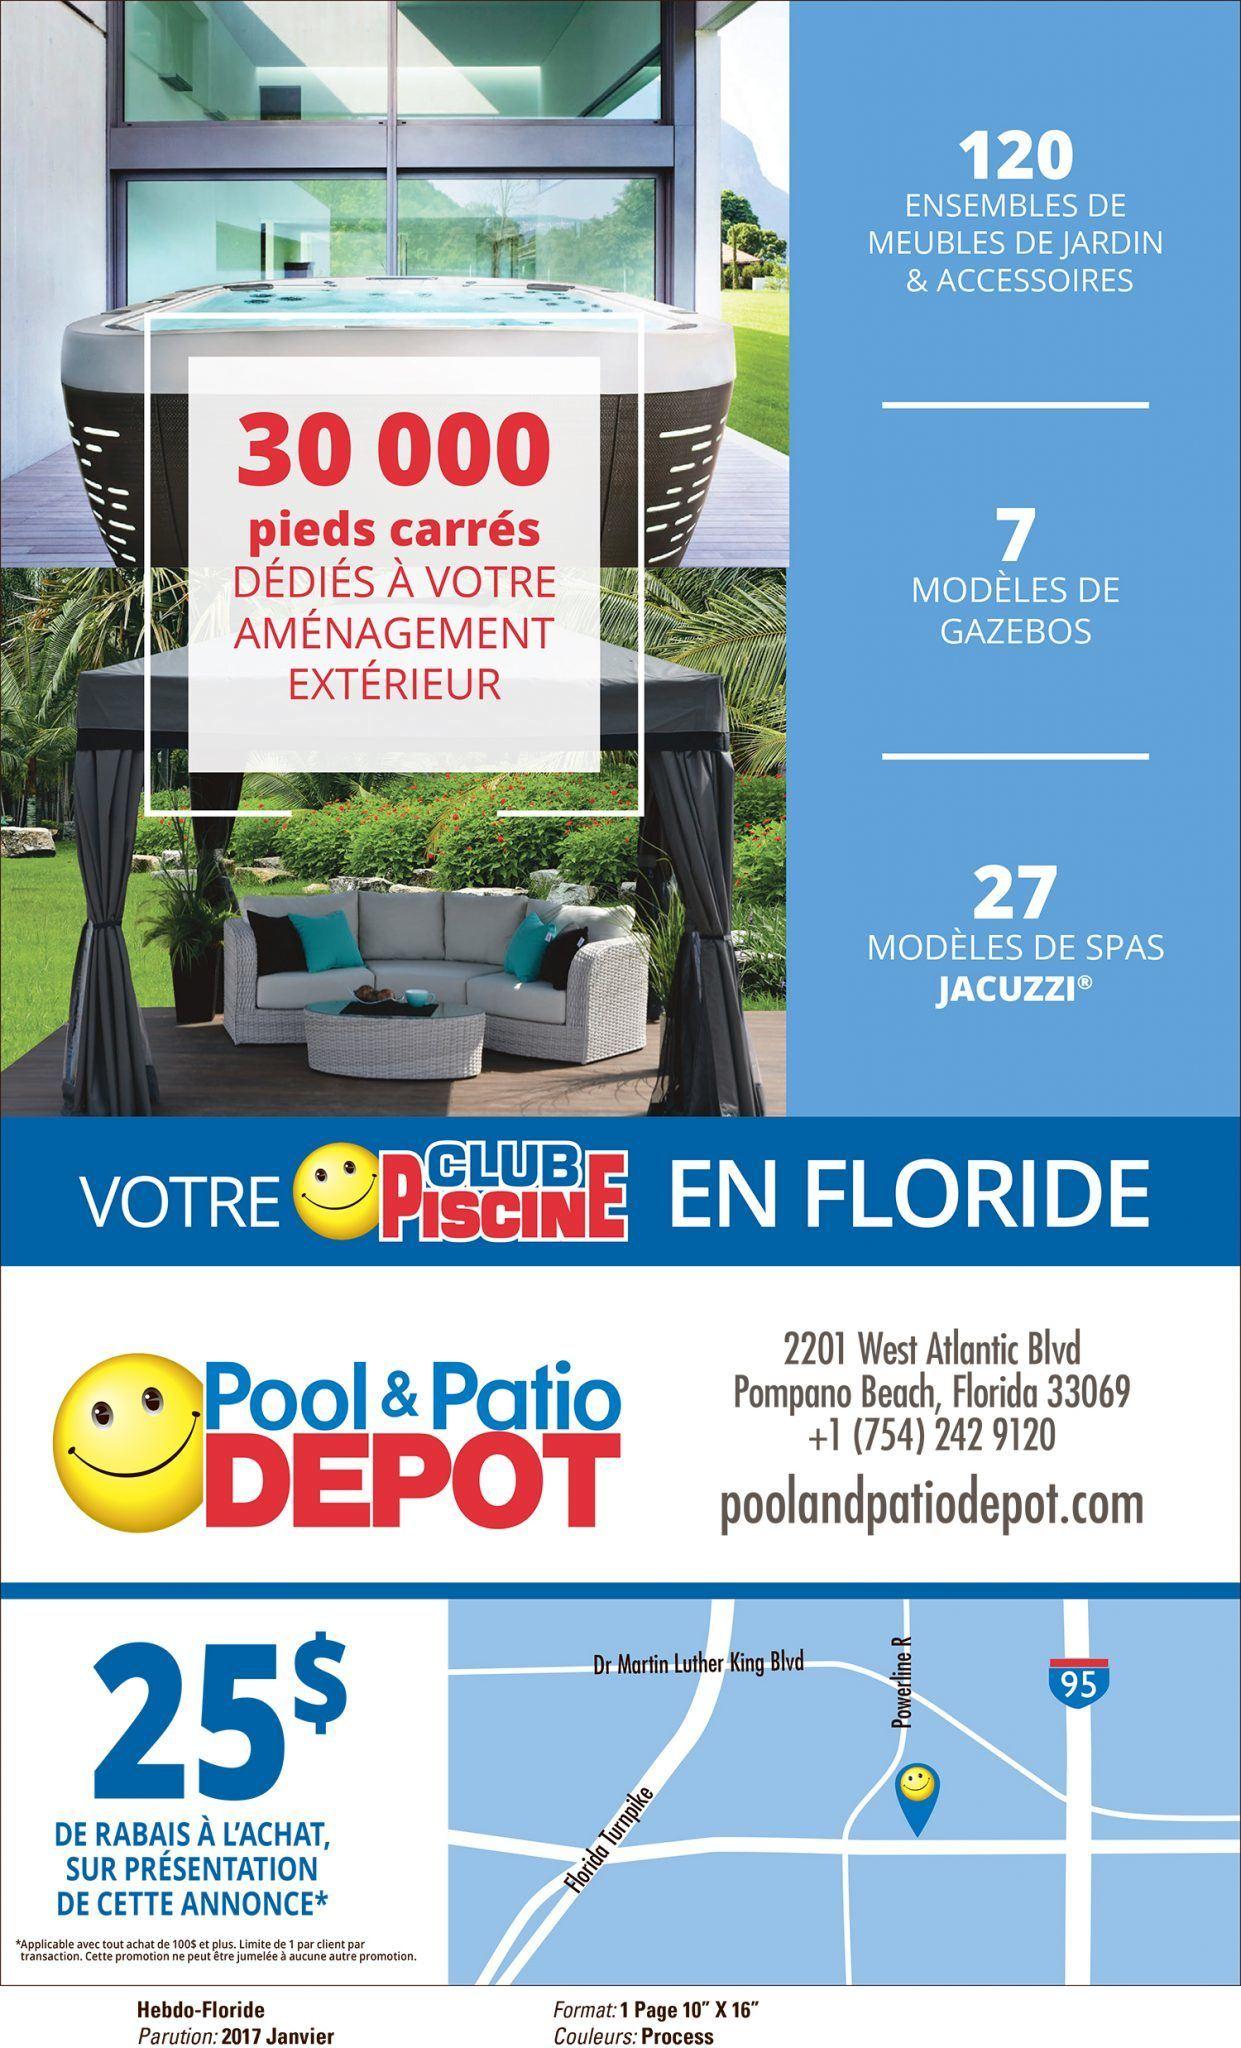 Pool-Patio-Depot-pompano-club-piscine-beach-floride-janv